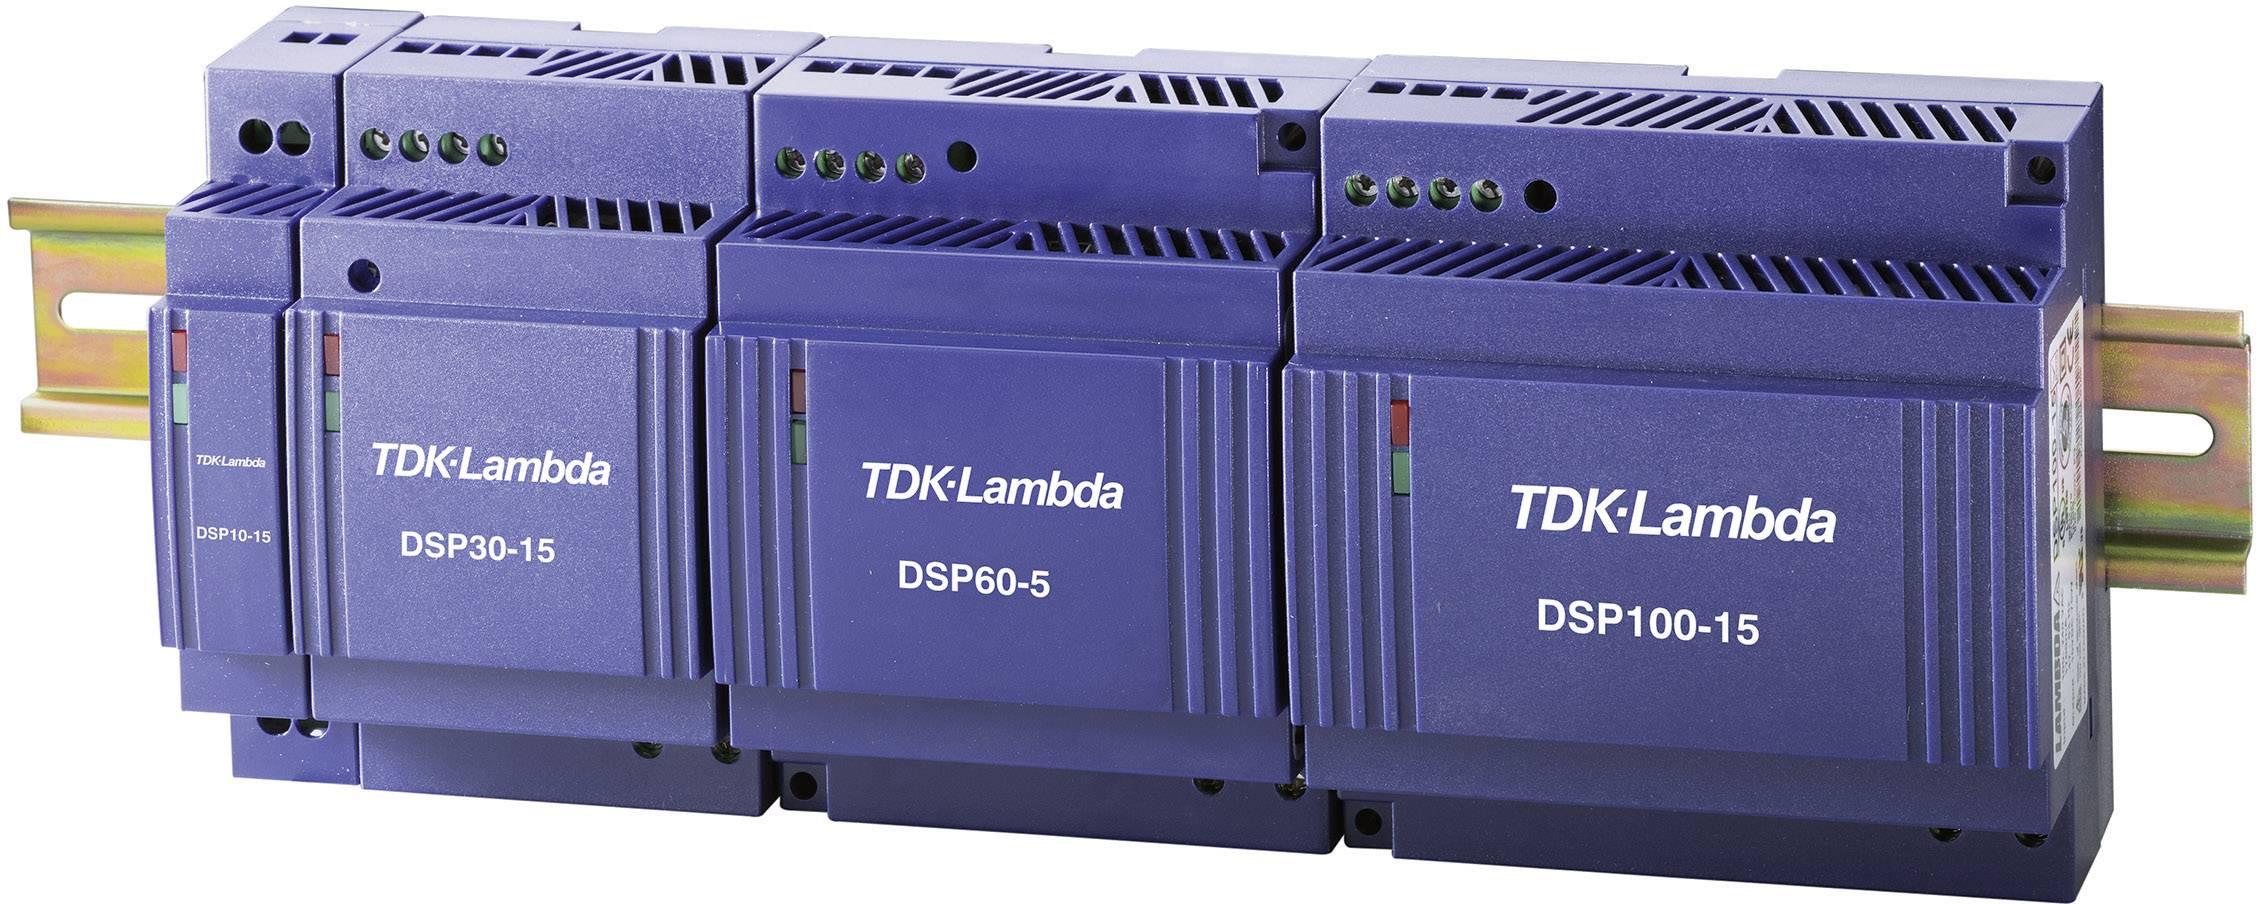 Sieťový zdroj na montážnu lištu (DIN lištu) TDK-Lambda DSP-10-5, 1 x, 5 V/DC, 1.5 A, 7.5 W